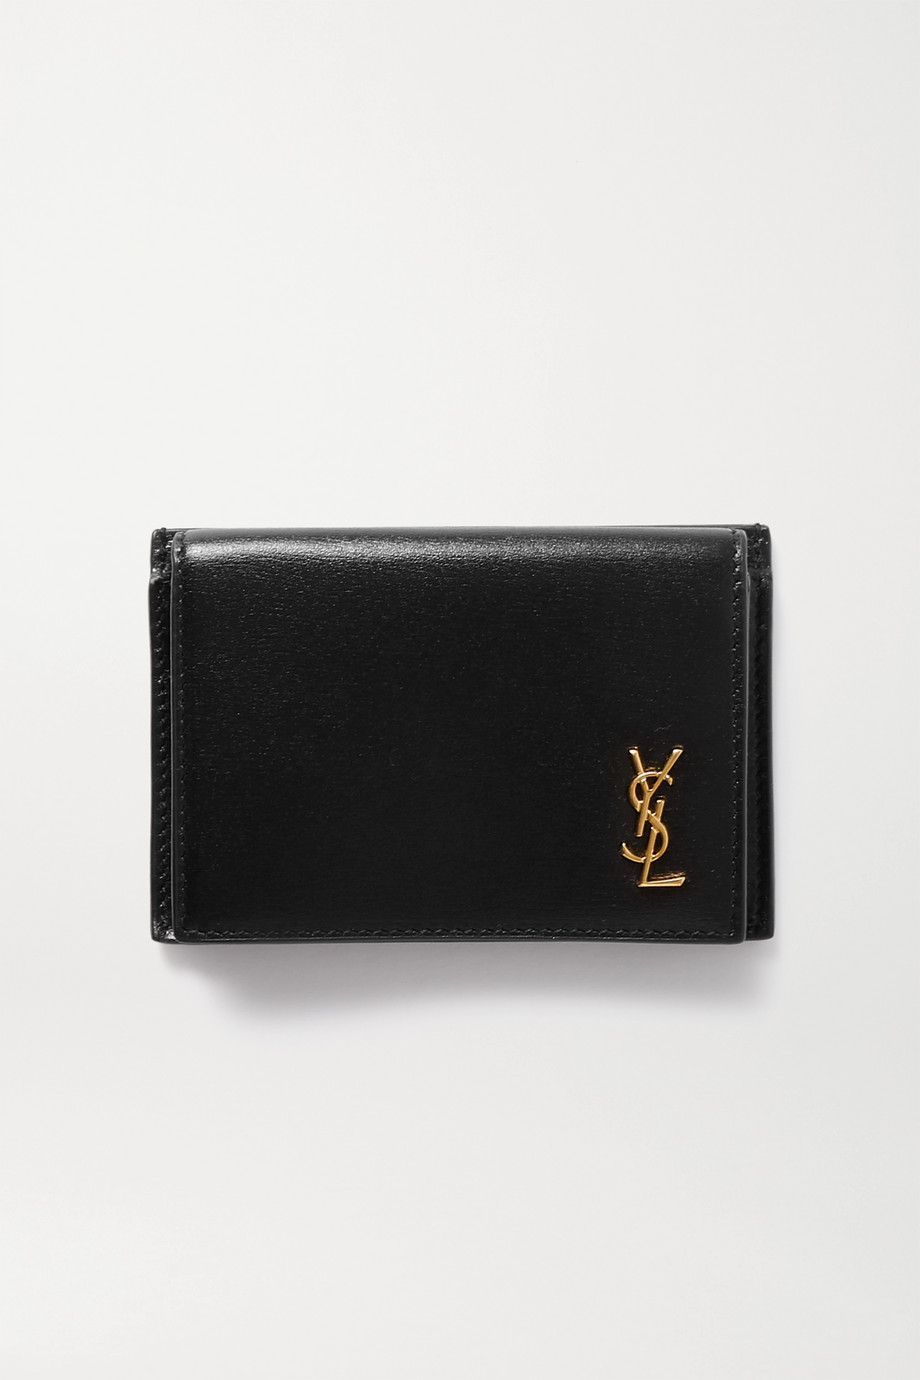 SAINT LAURENT Monogramme 纹理皮革卡夹